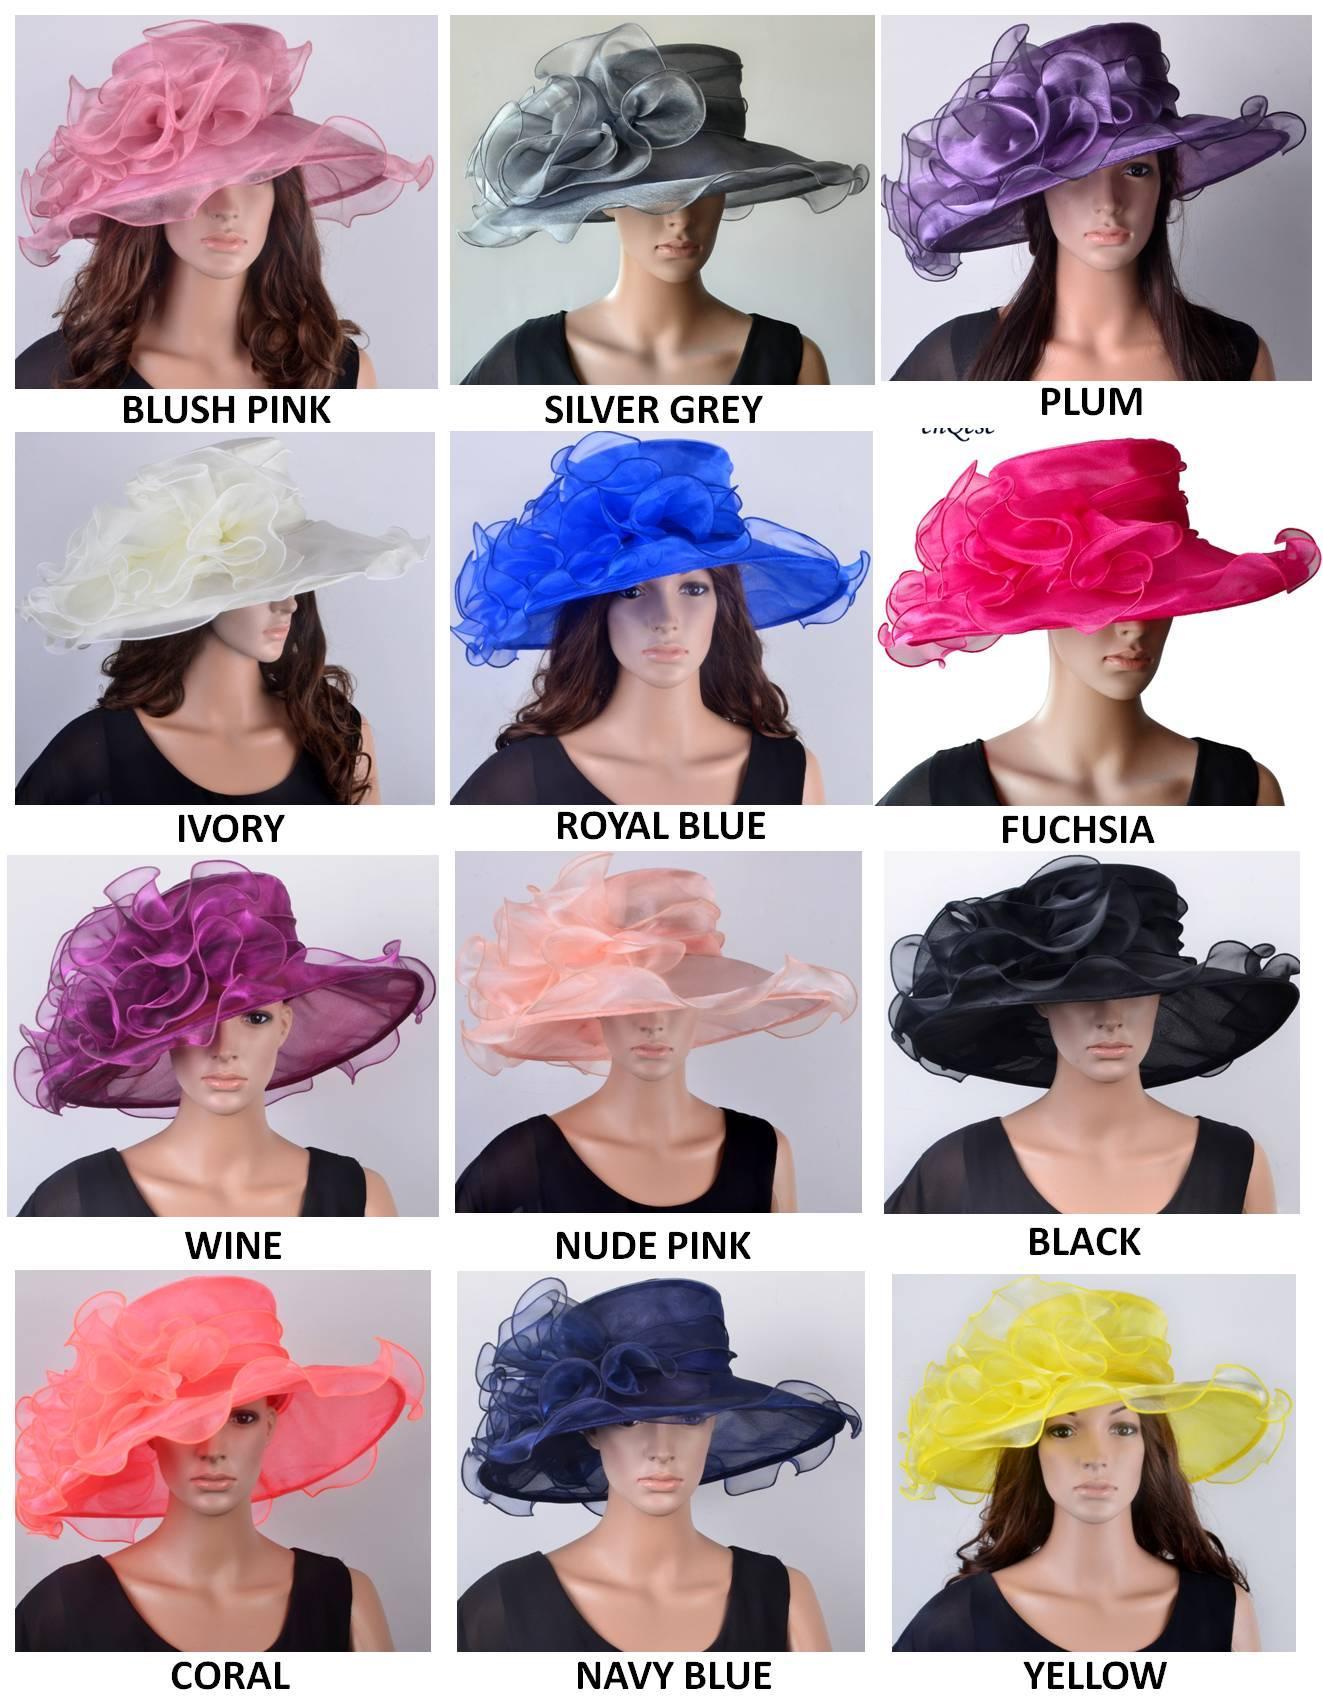 80684a5a5ba94 Large Brim Crystal Organza Hat Sinamay Hat Bridal Headpiece For Wedding  Kentucky Derby Church. Pink Hats For Weddings Pink Wedding Hat From  Qescgroup